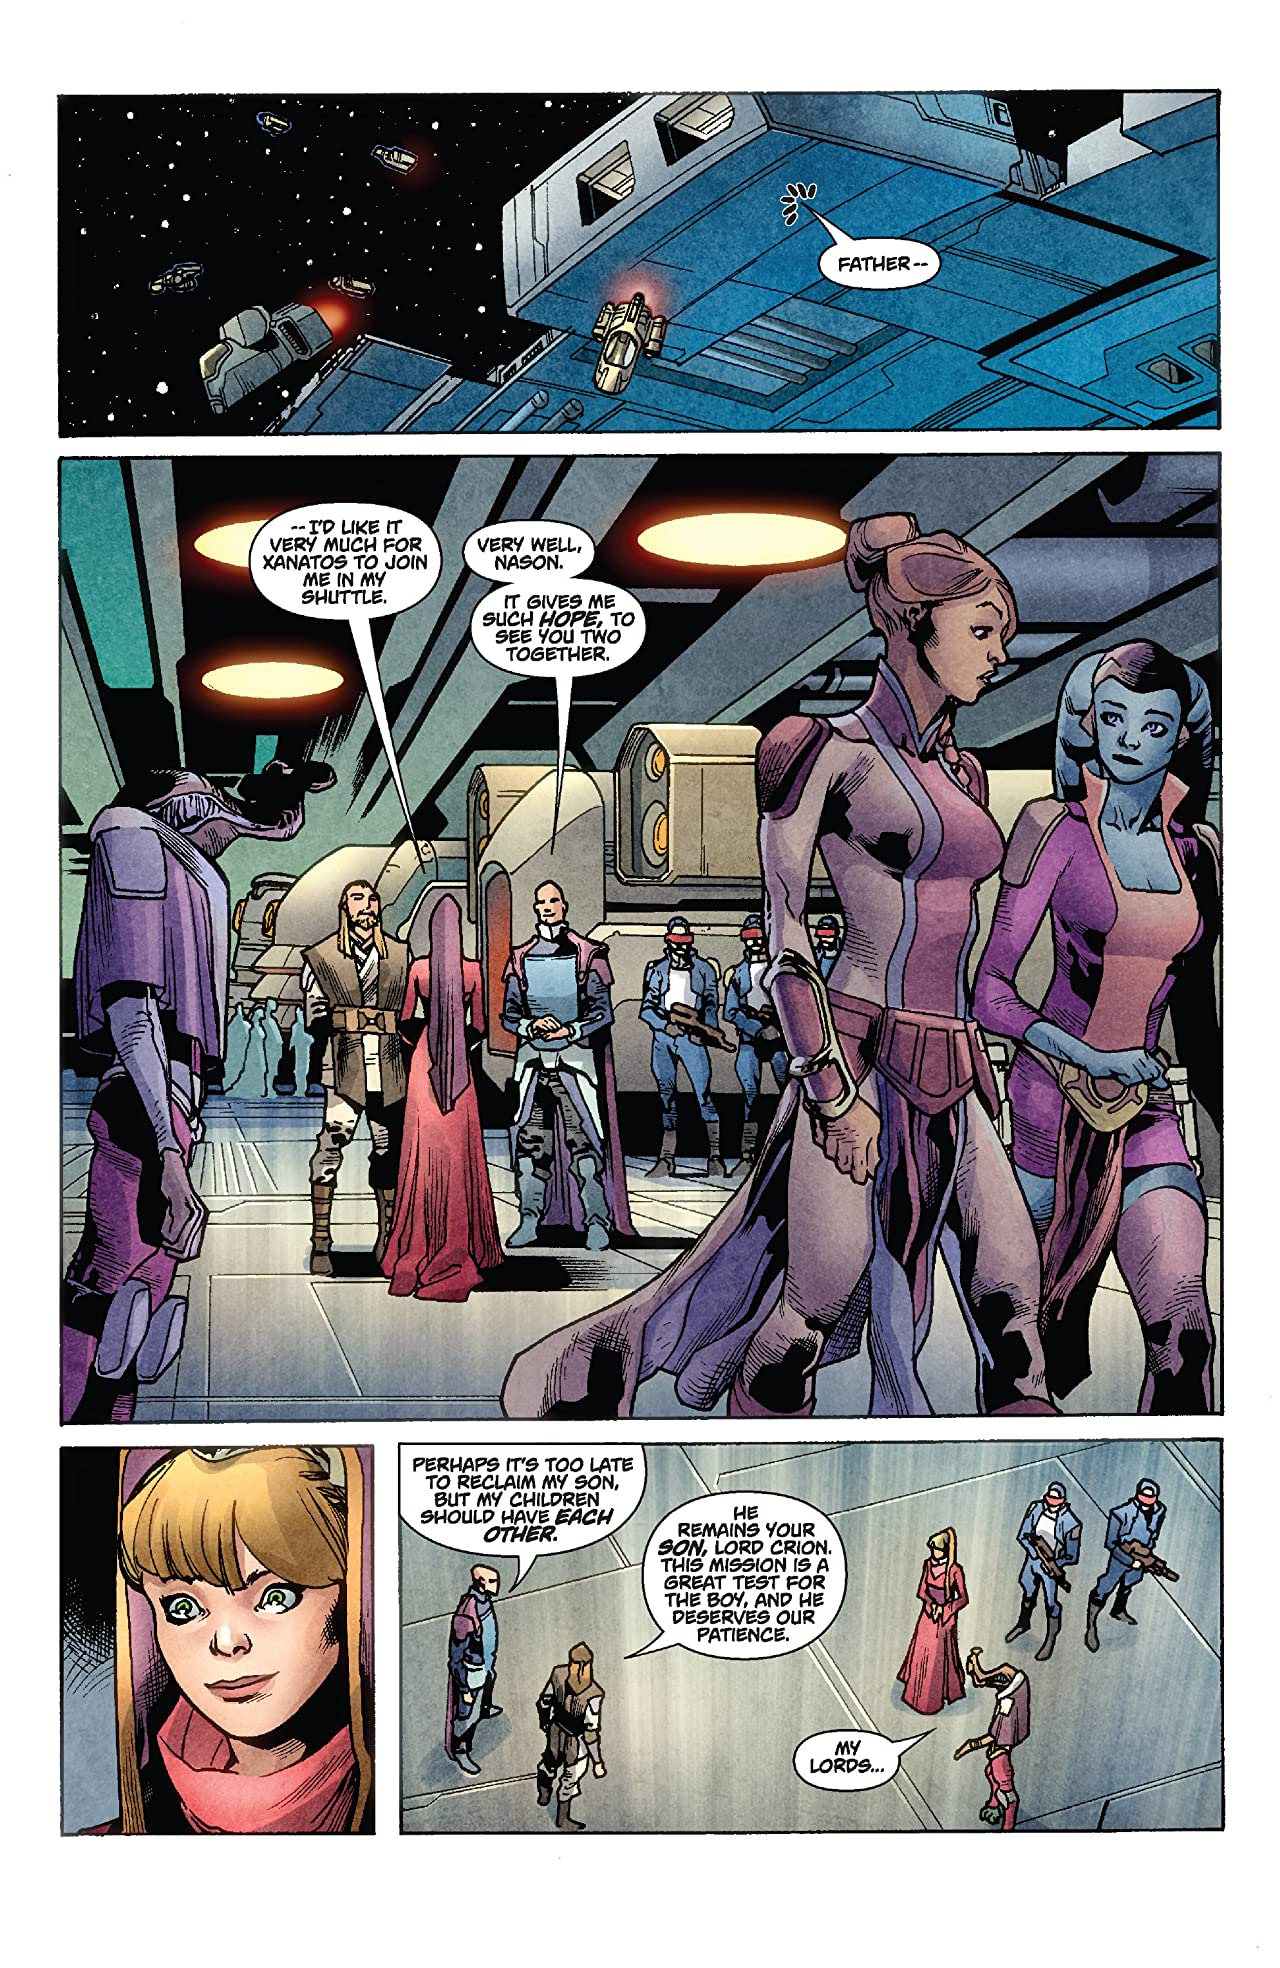 Star Wars: Jedi - The Dark Side (2011) #3 (of 5)